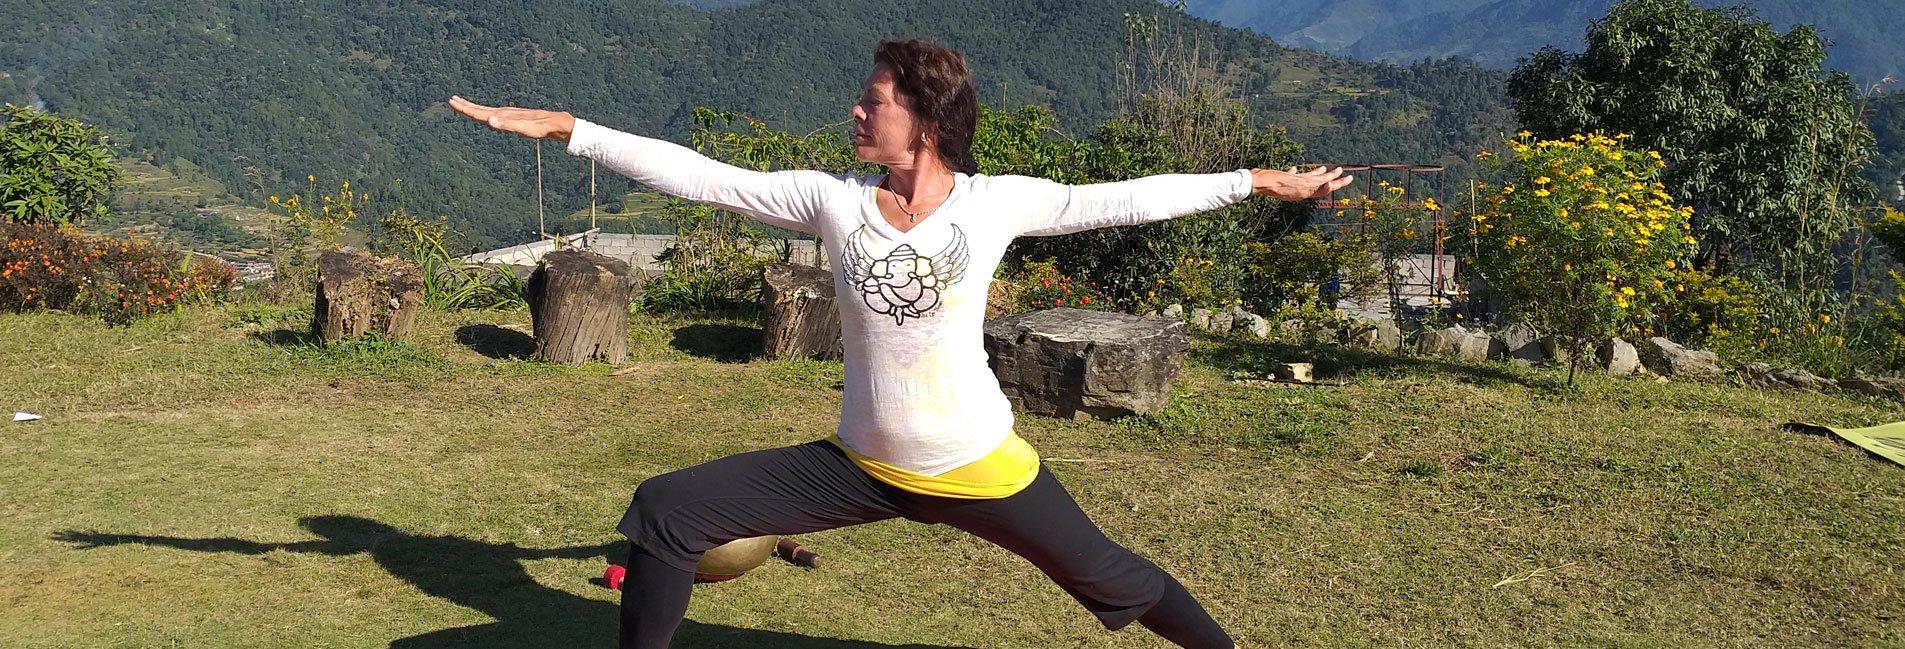 Poon Hill Trekking mit Yoga in Nepal